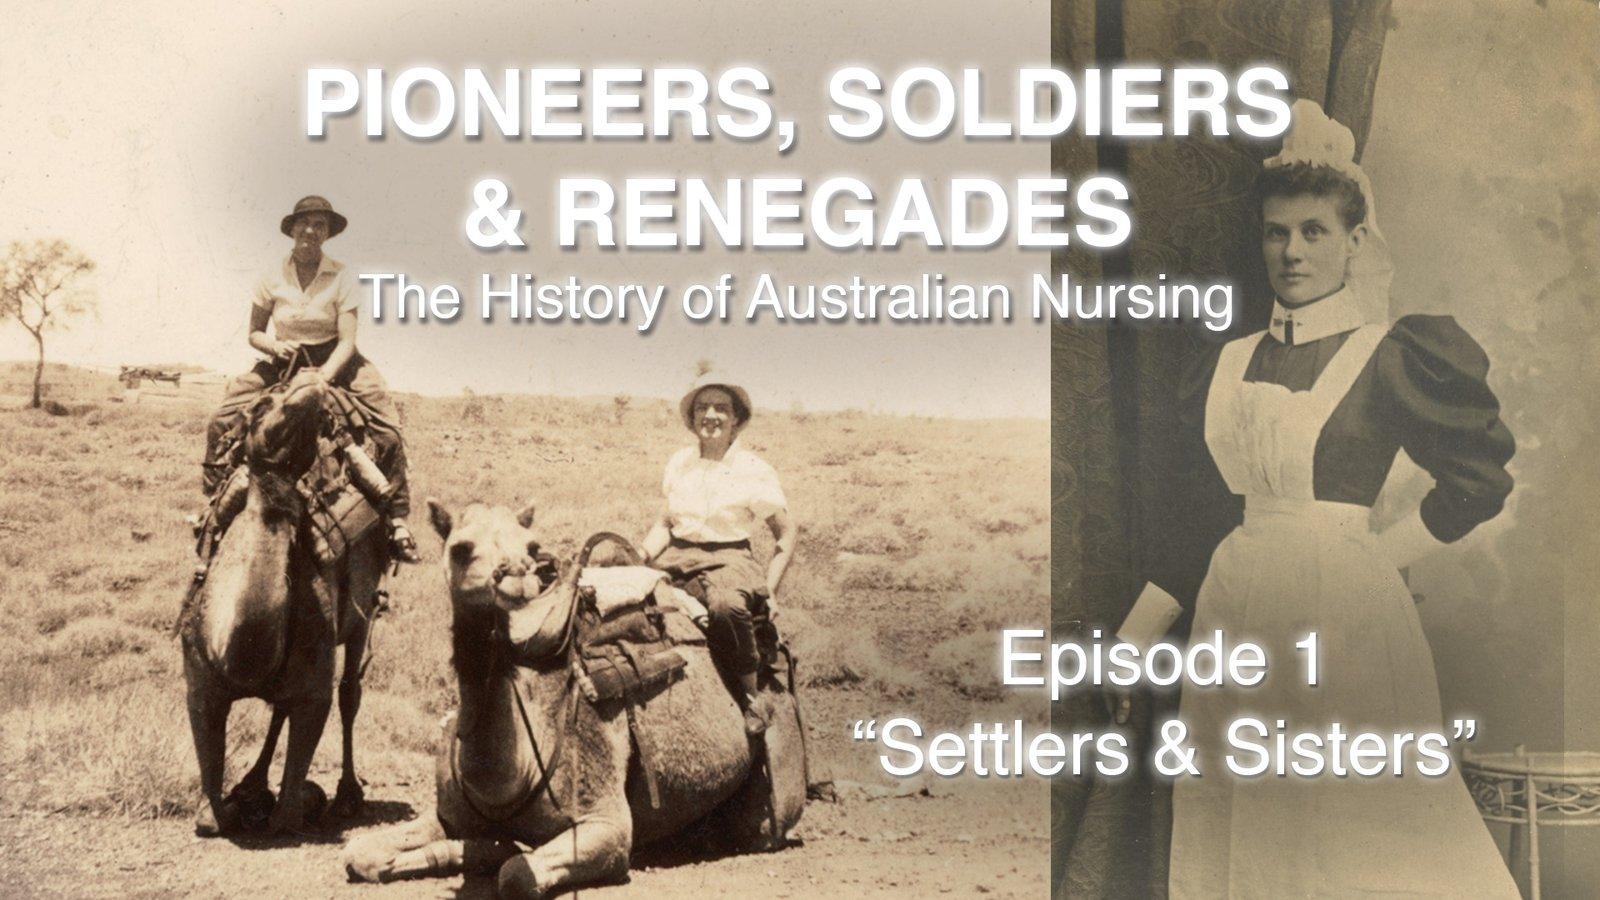 Settlers & Sisters